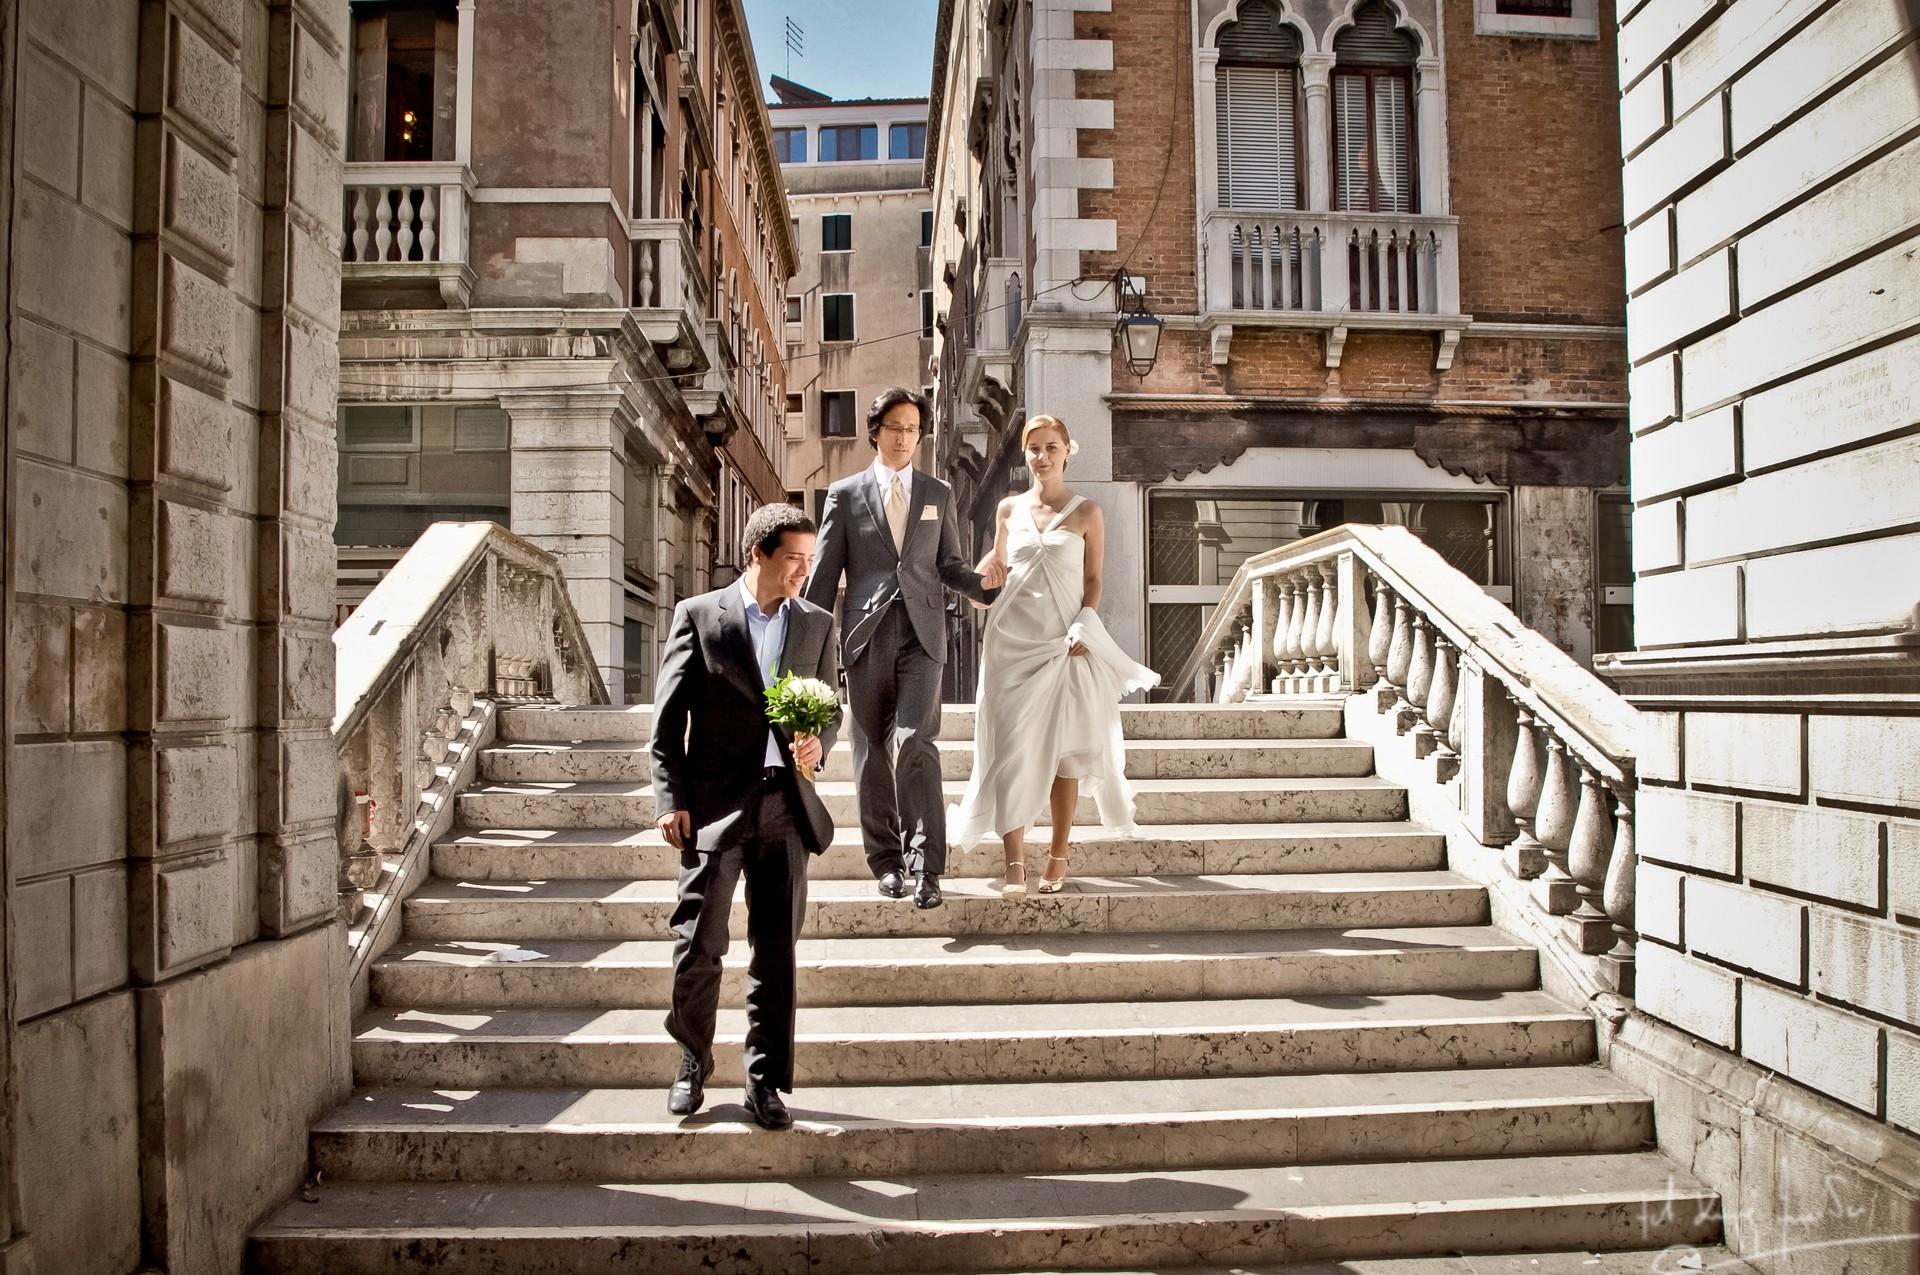 Ślub w wenecji 47 Manuela Luiza & Young Seon Song